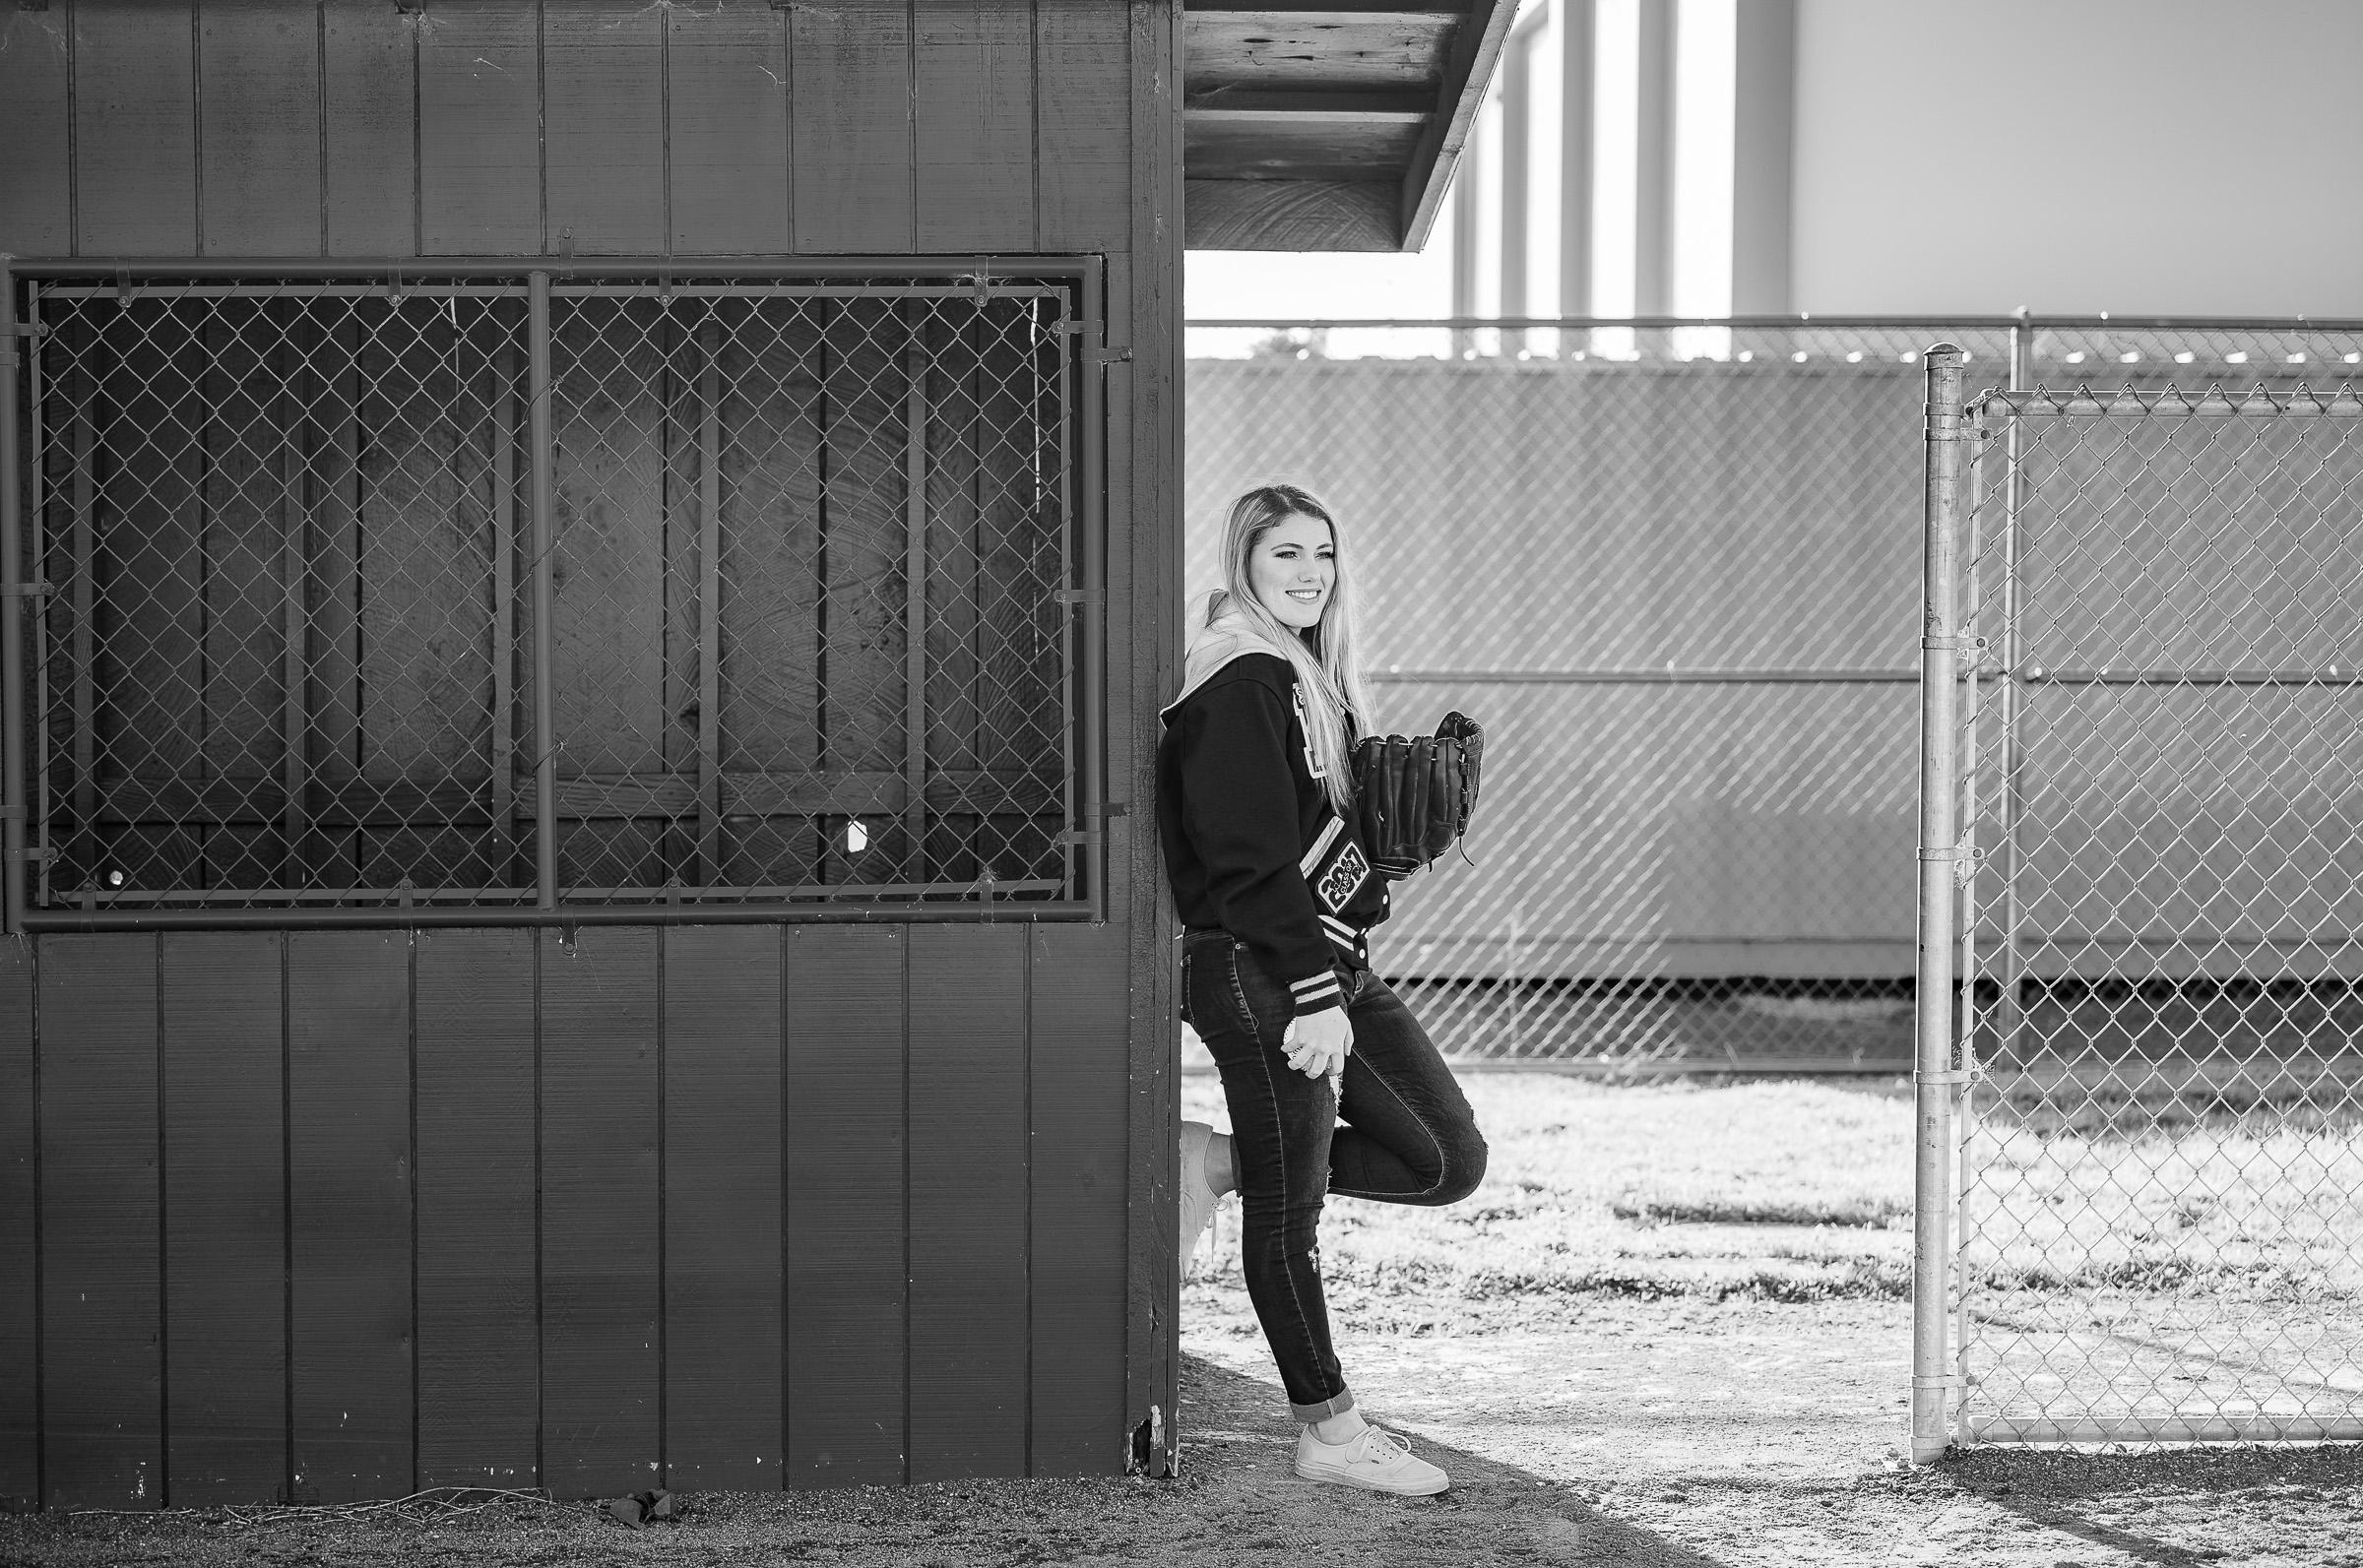 HumboldtCountySeniorPhotographer-Shelby-FortunaHigh-Softball-3.JPG